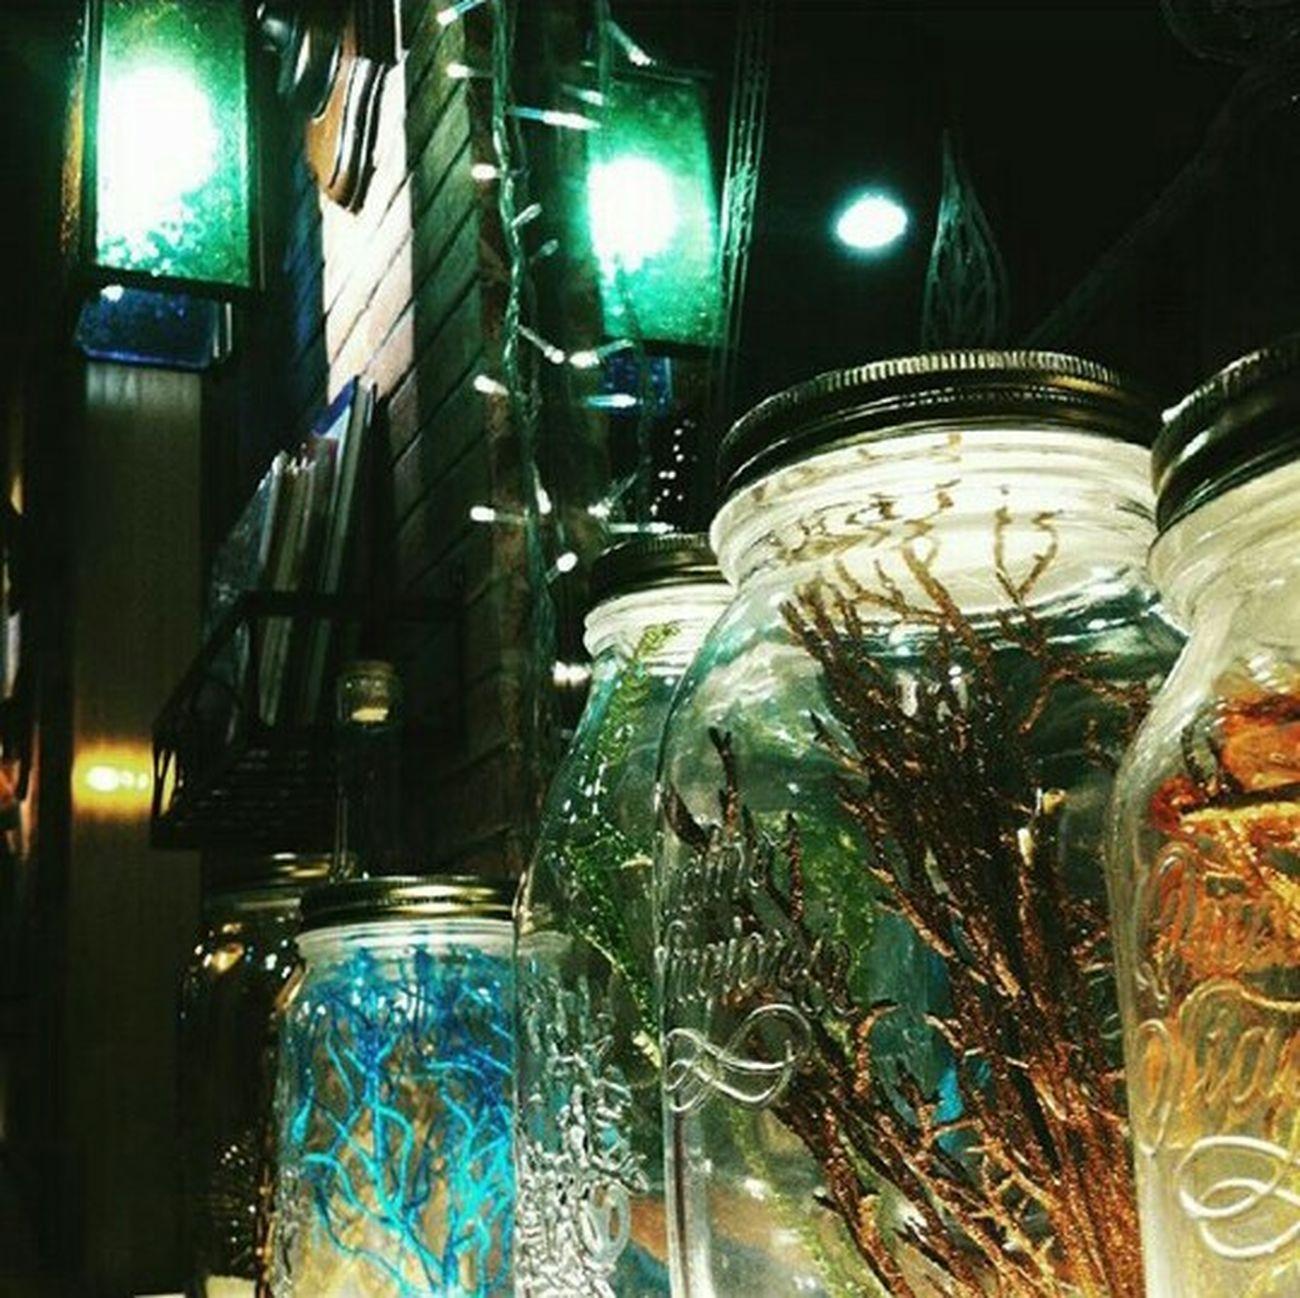 Beautifully Organized First Eyeem Photo Jars  Jars Of Lights Dark Darkness And Light Darkness